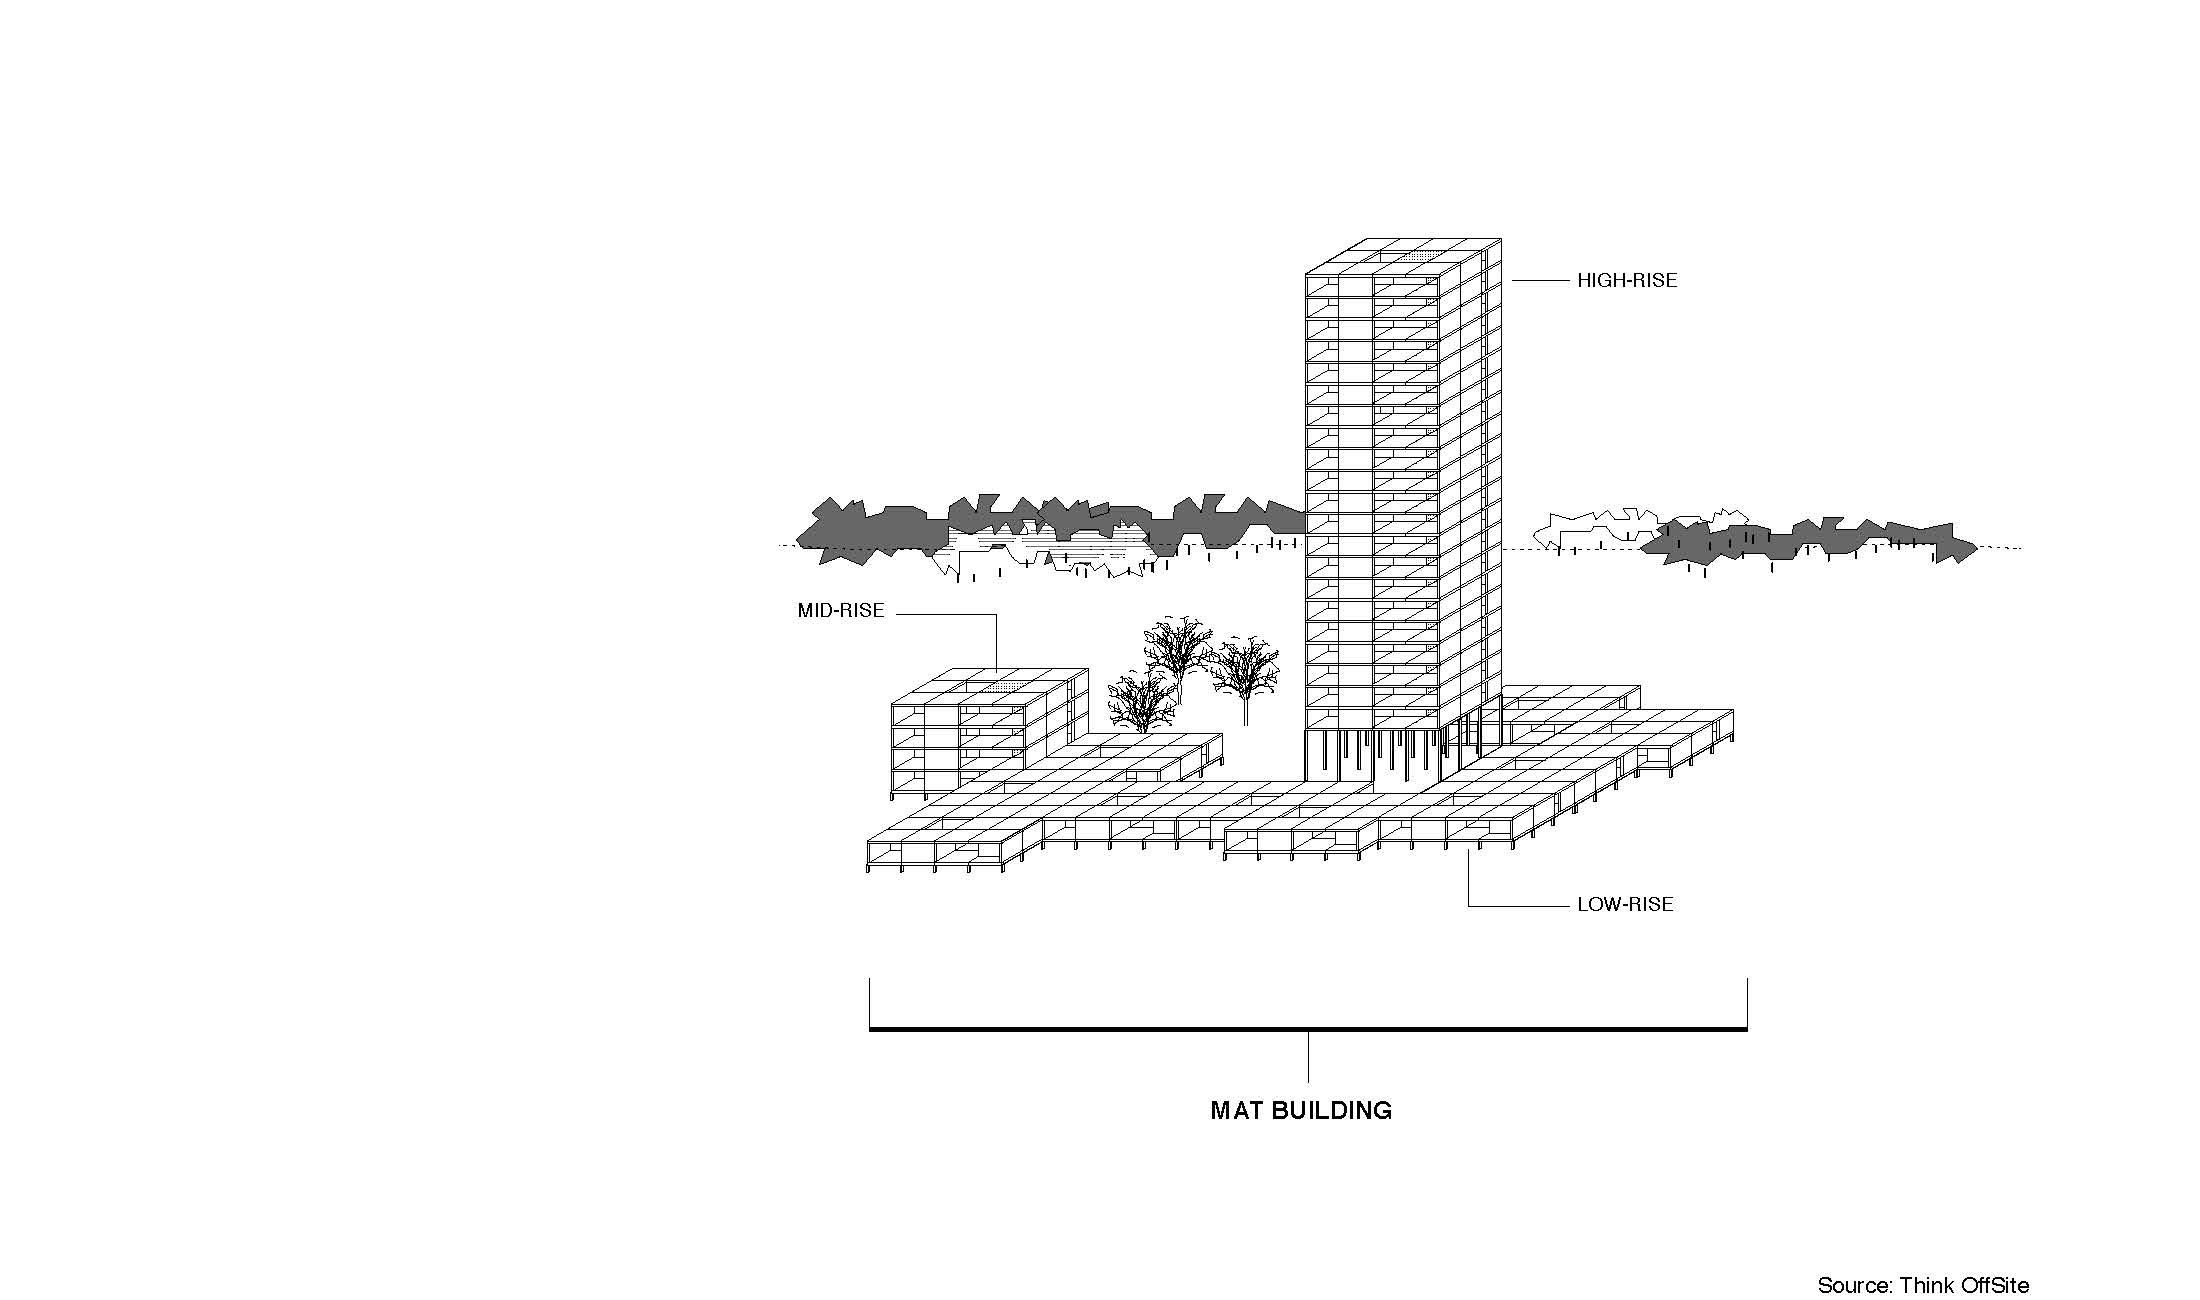 Maciunas Assessment Report 0509_Page_58.jpg